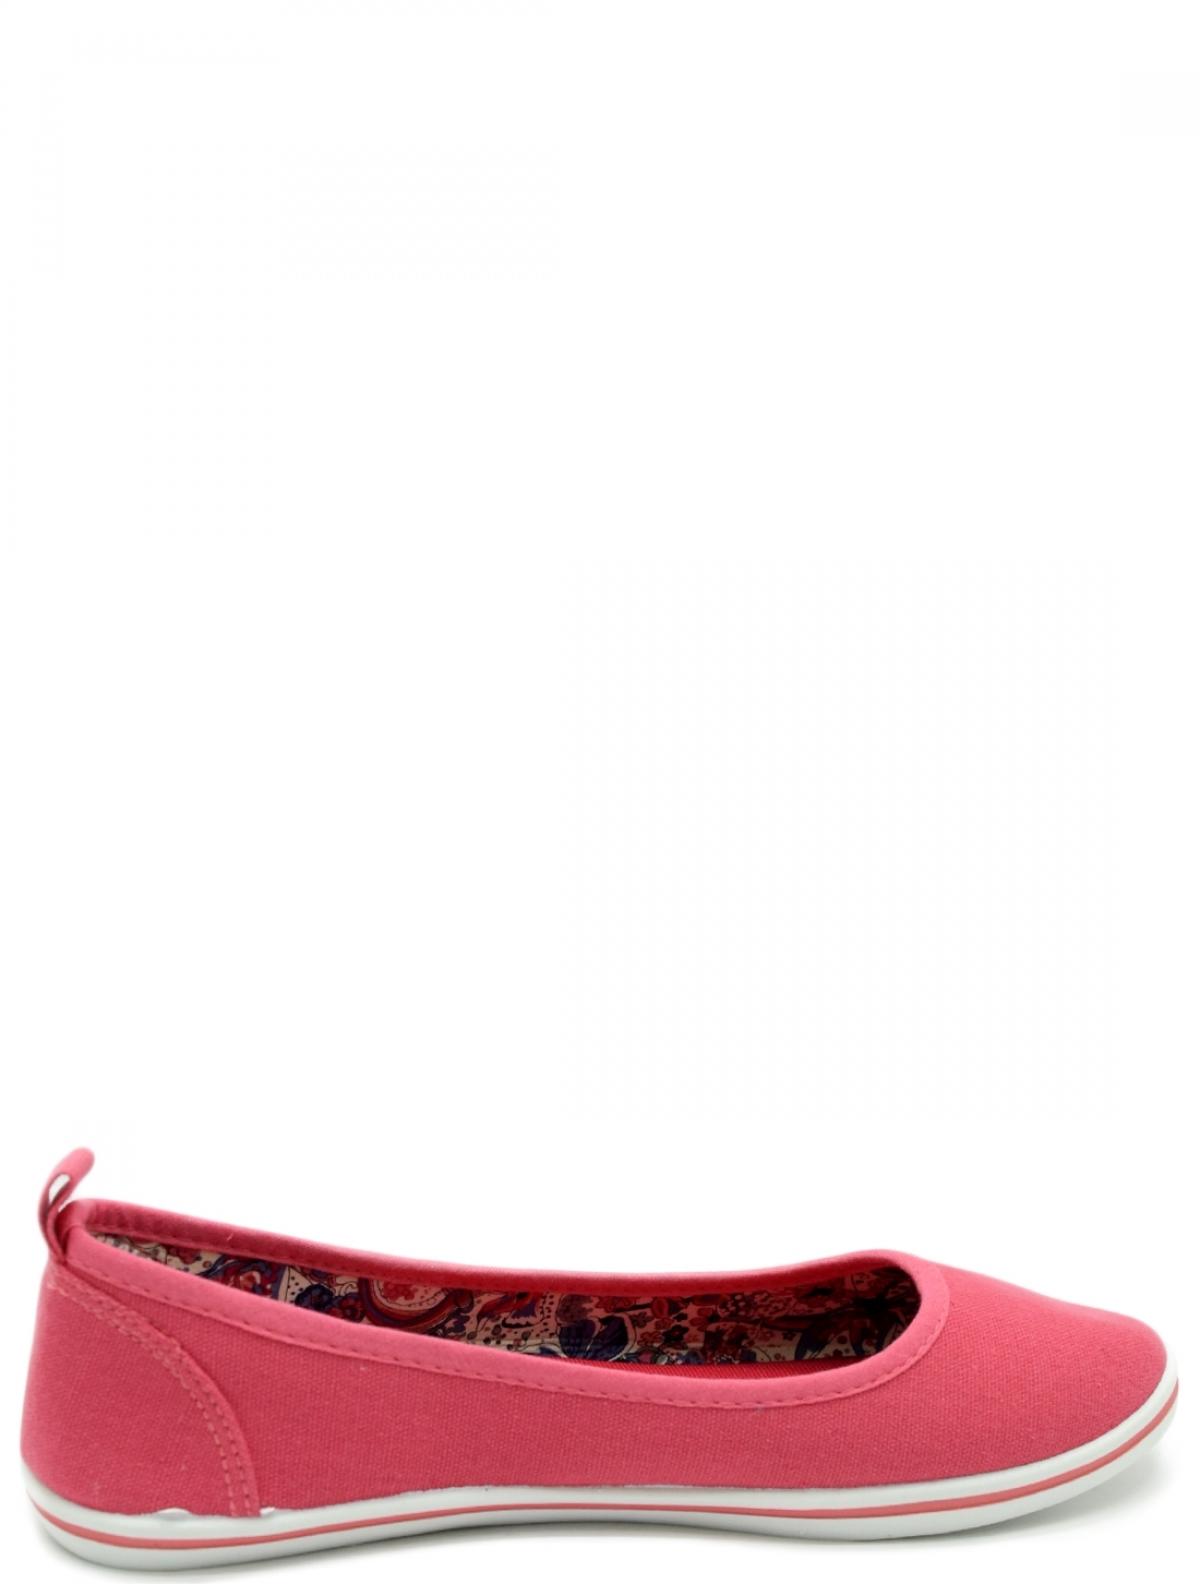 CROSBY 487243/03-01 туфли для девочки